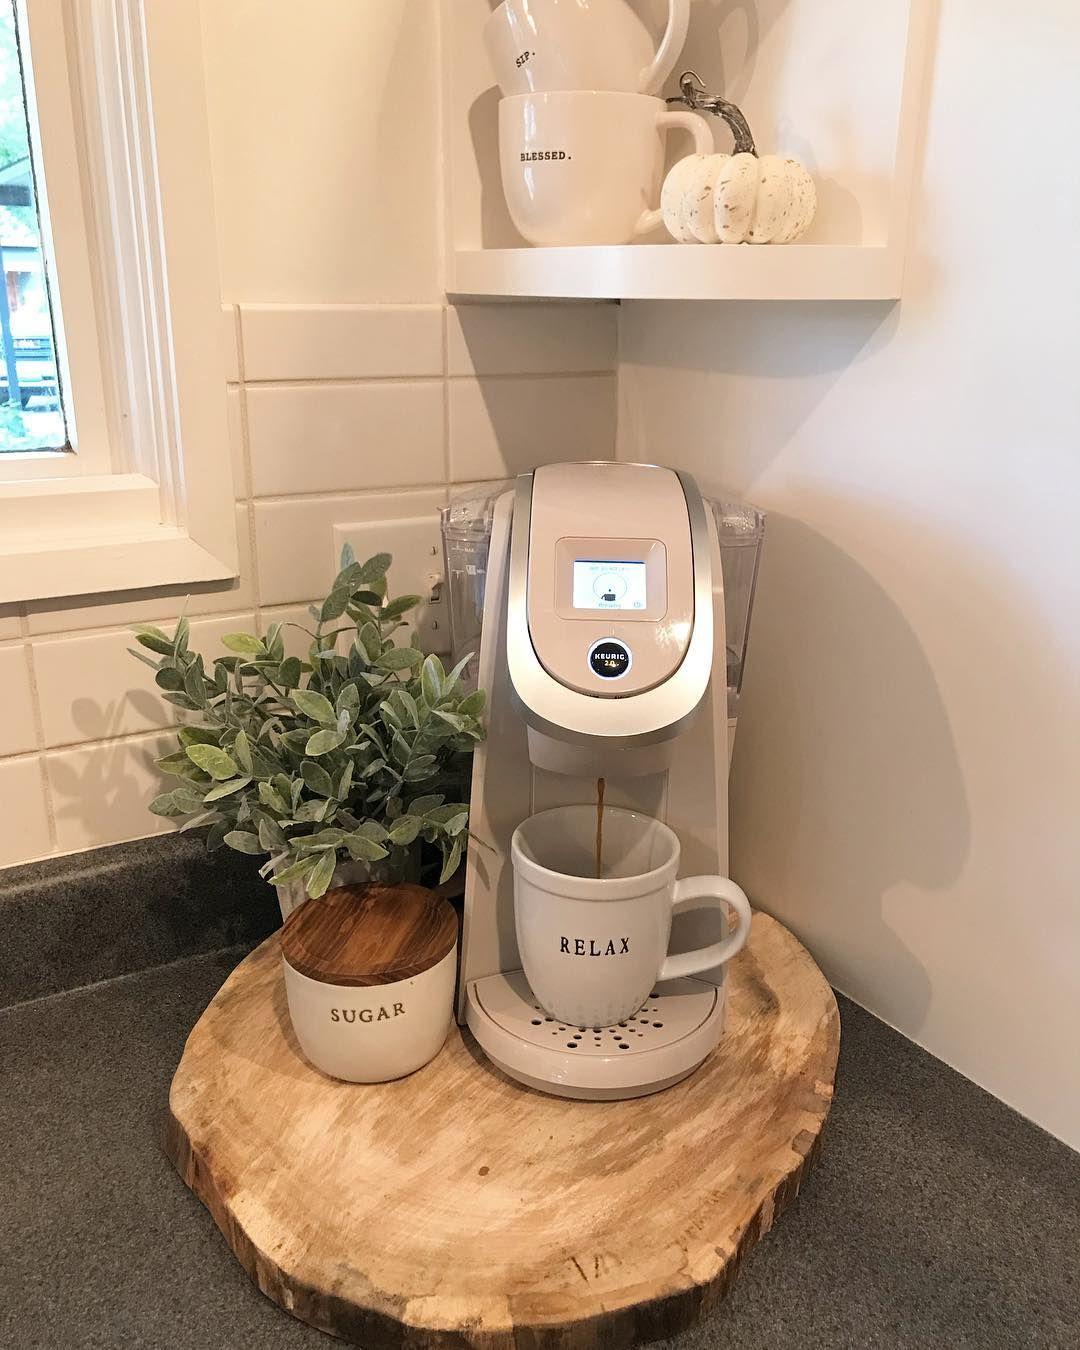 Apartment Kitchen Decorating Ideas: Coffee Bar Ideas Kitchen Counter, Coffee Bar Ideas For